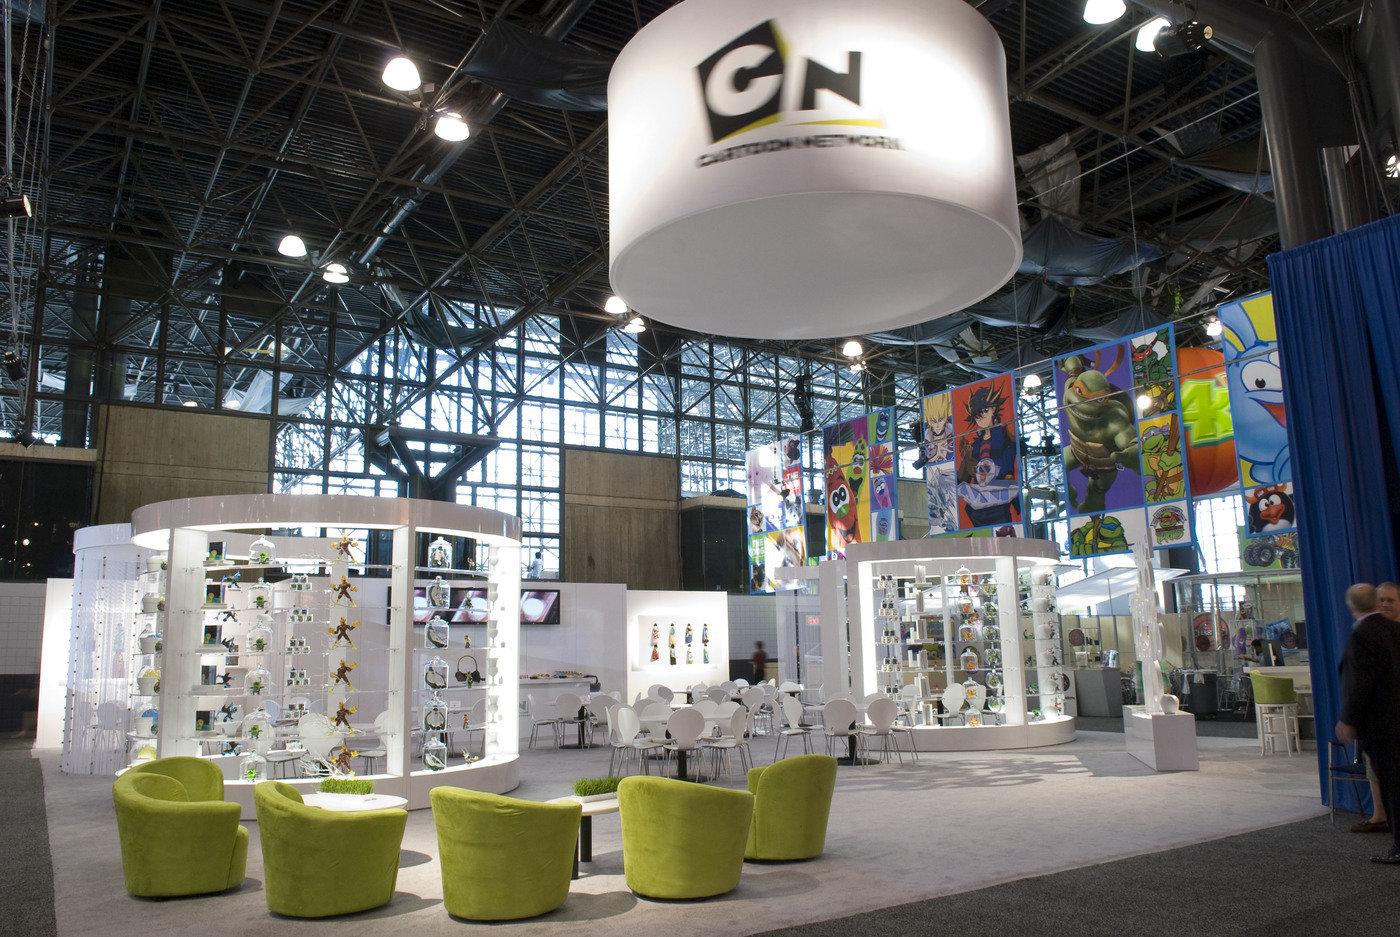 Exhibition Stand Builders New York : Portfolio by stephen gentile at coroflot